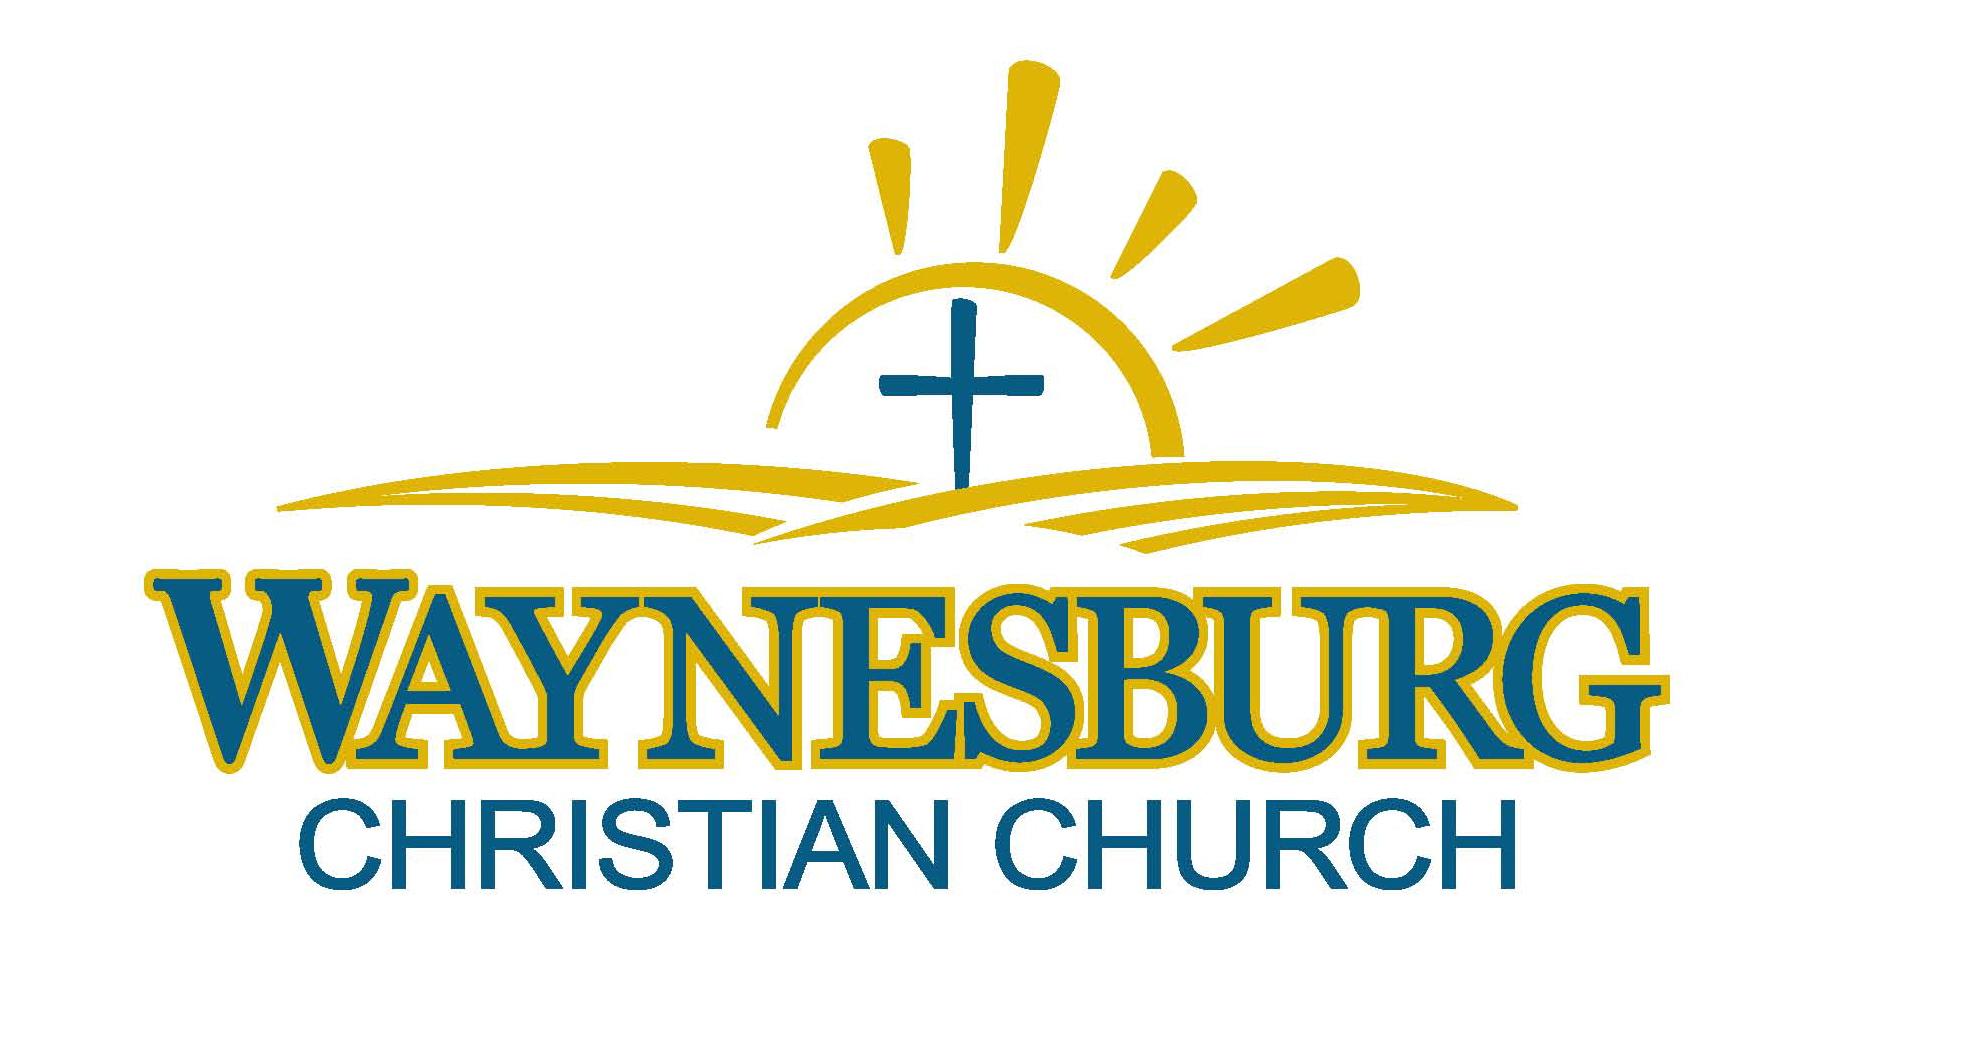 Waynesburg-Church-copy.jpg